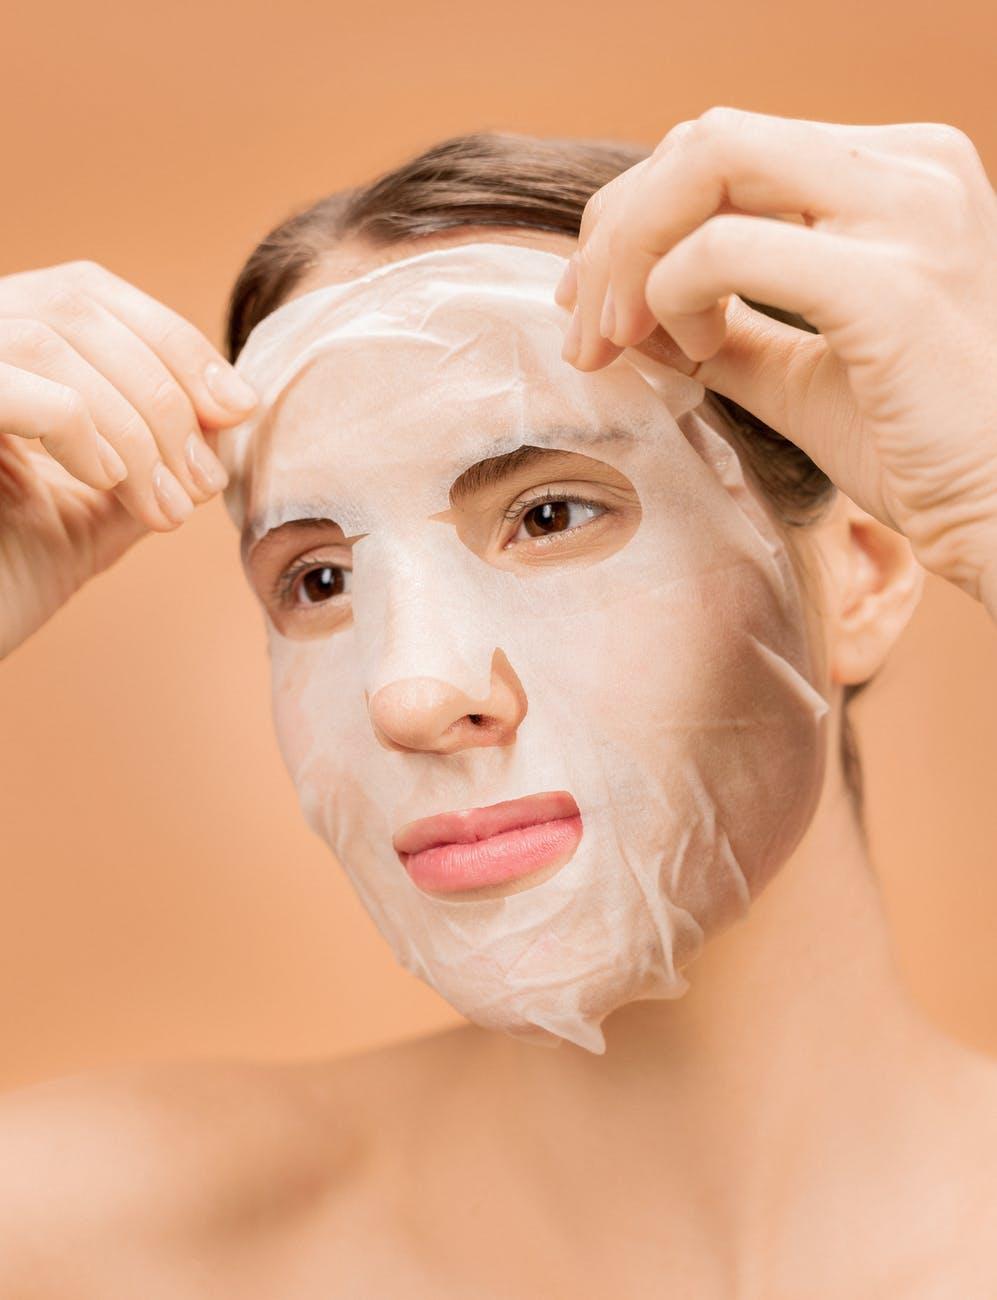 Diy Rice Water For Skin Whitening Korean Beauty Secrets Best Beauty Lifestyle Blog